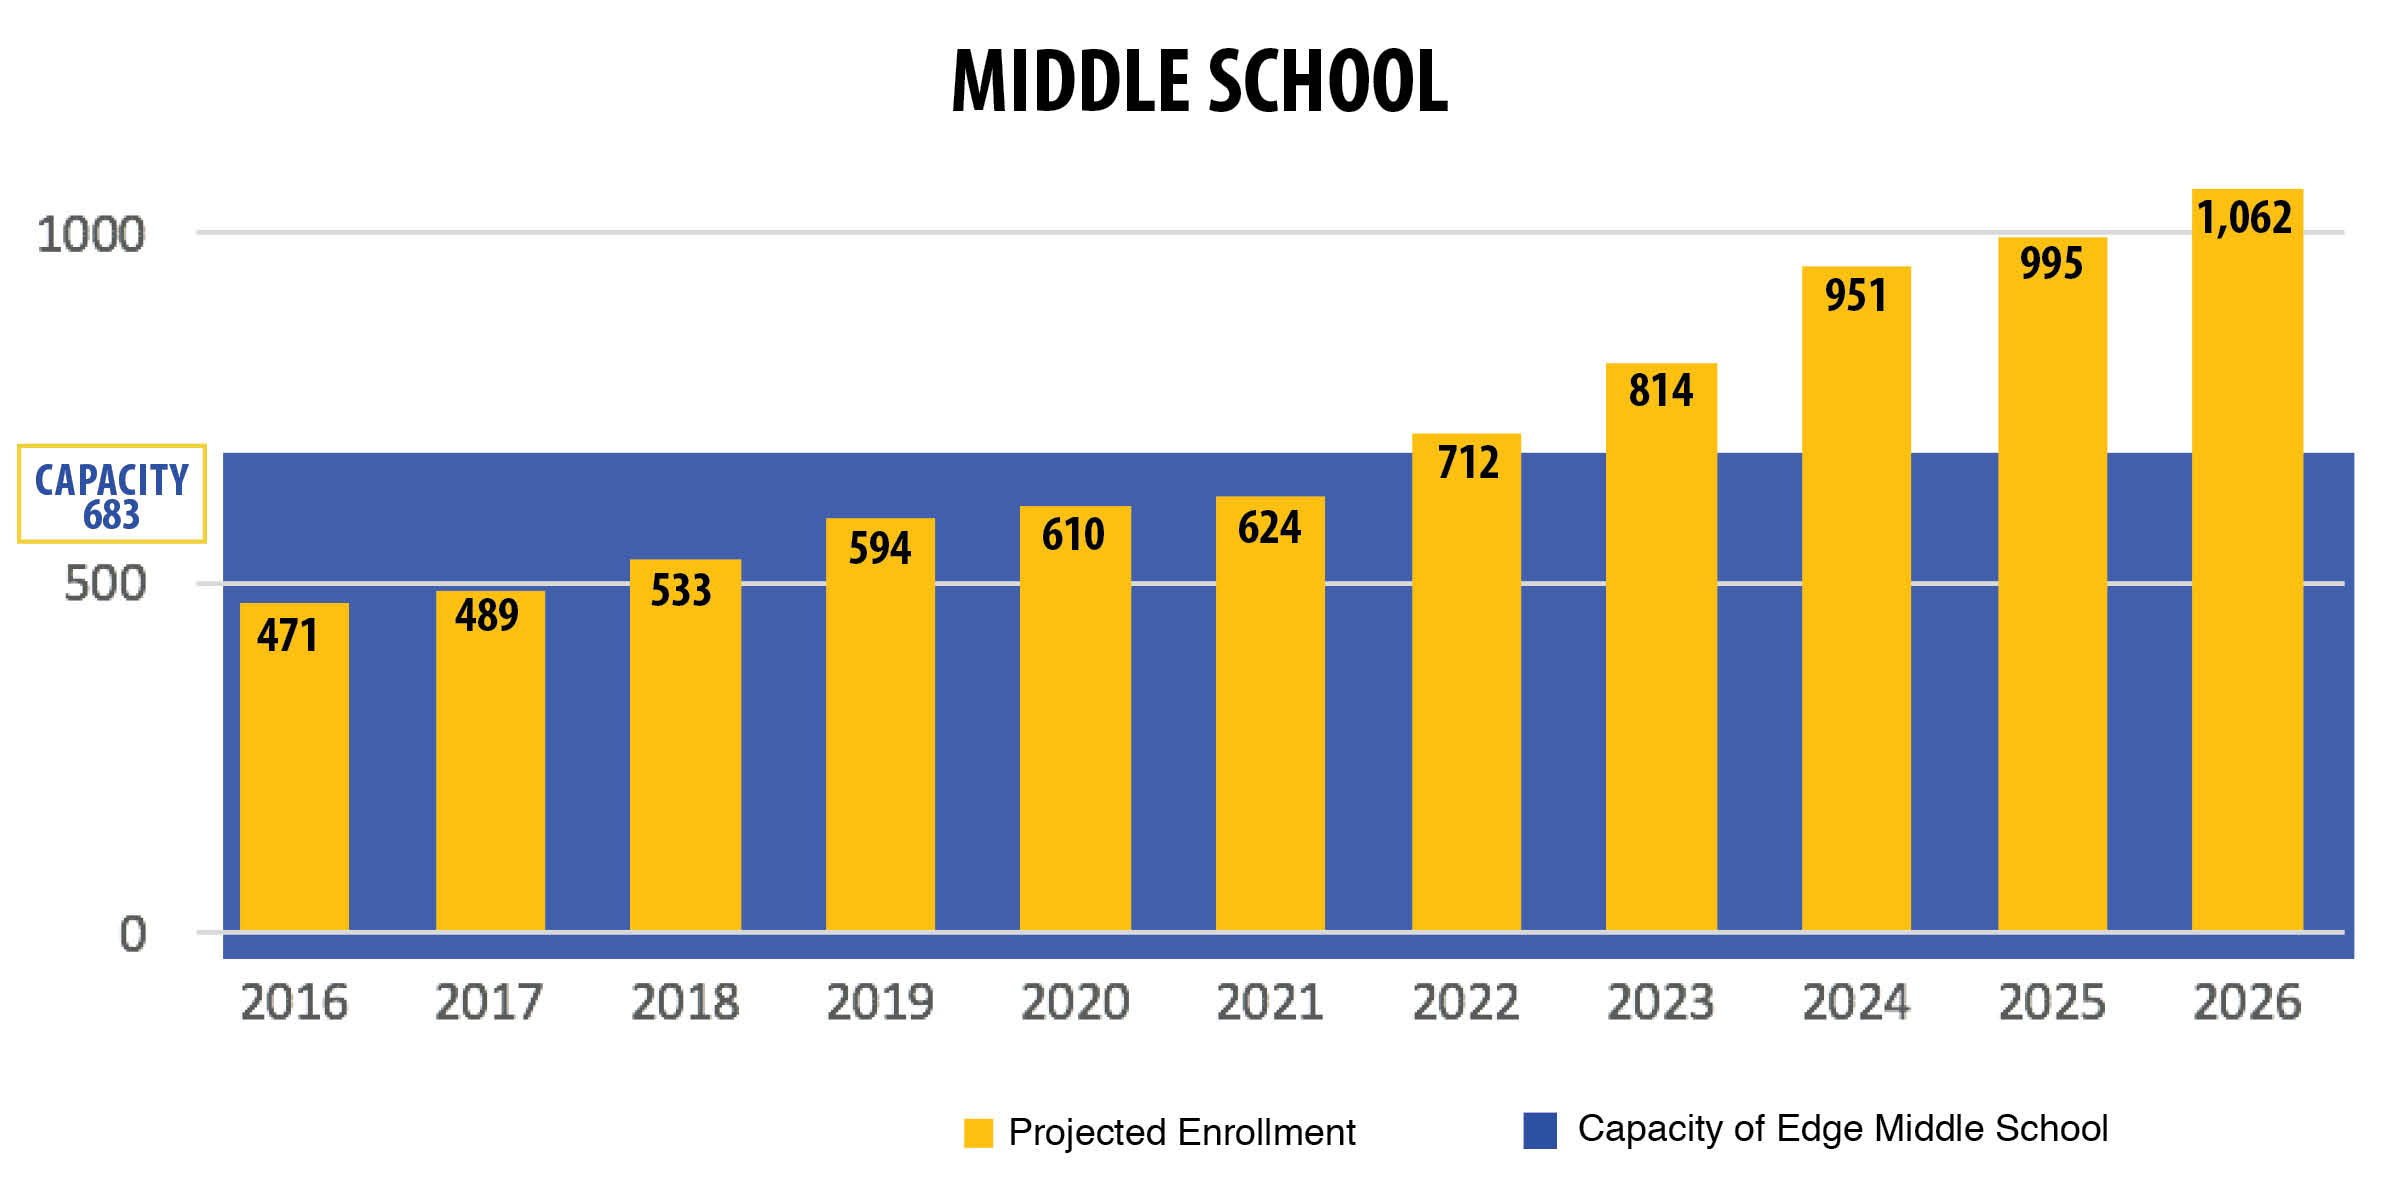 Middle School Capacity Bar Chart.jpg